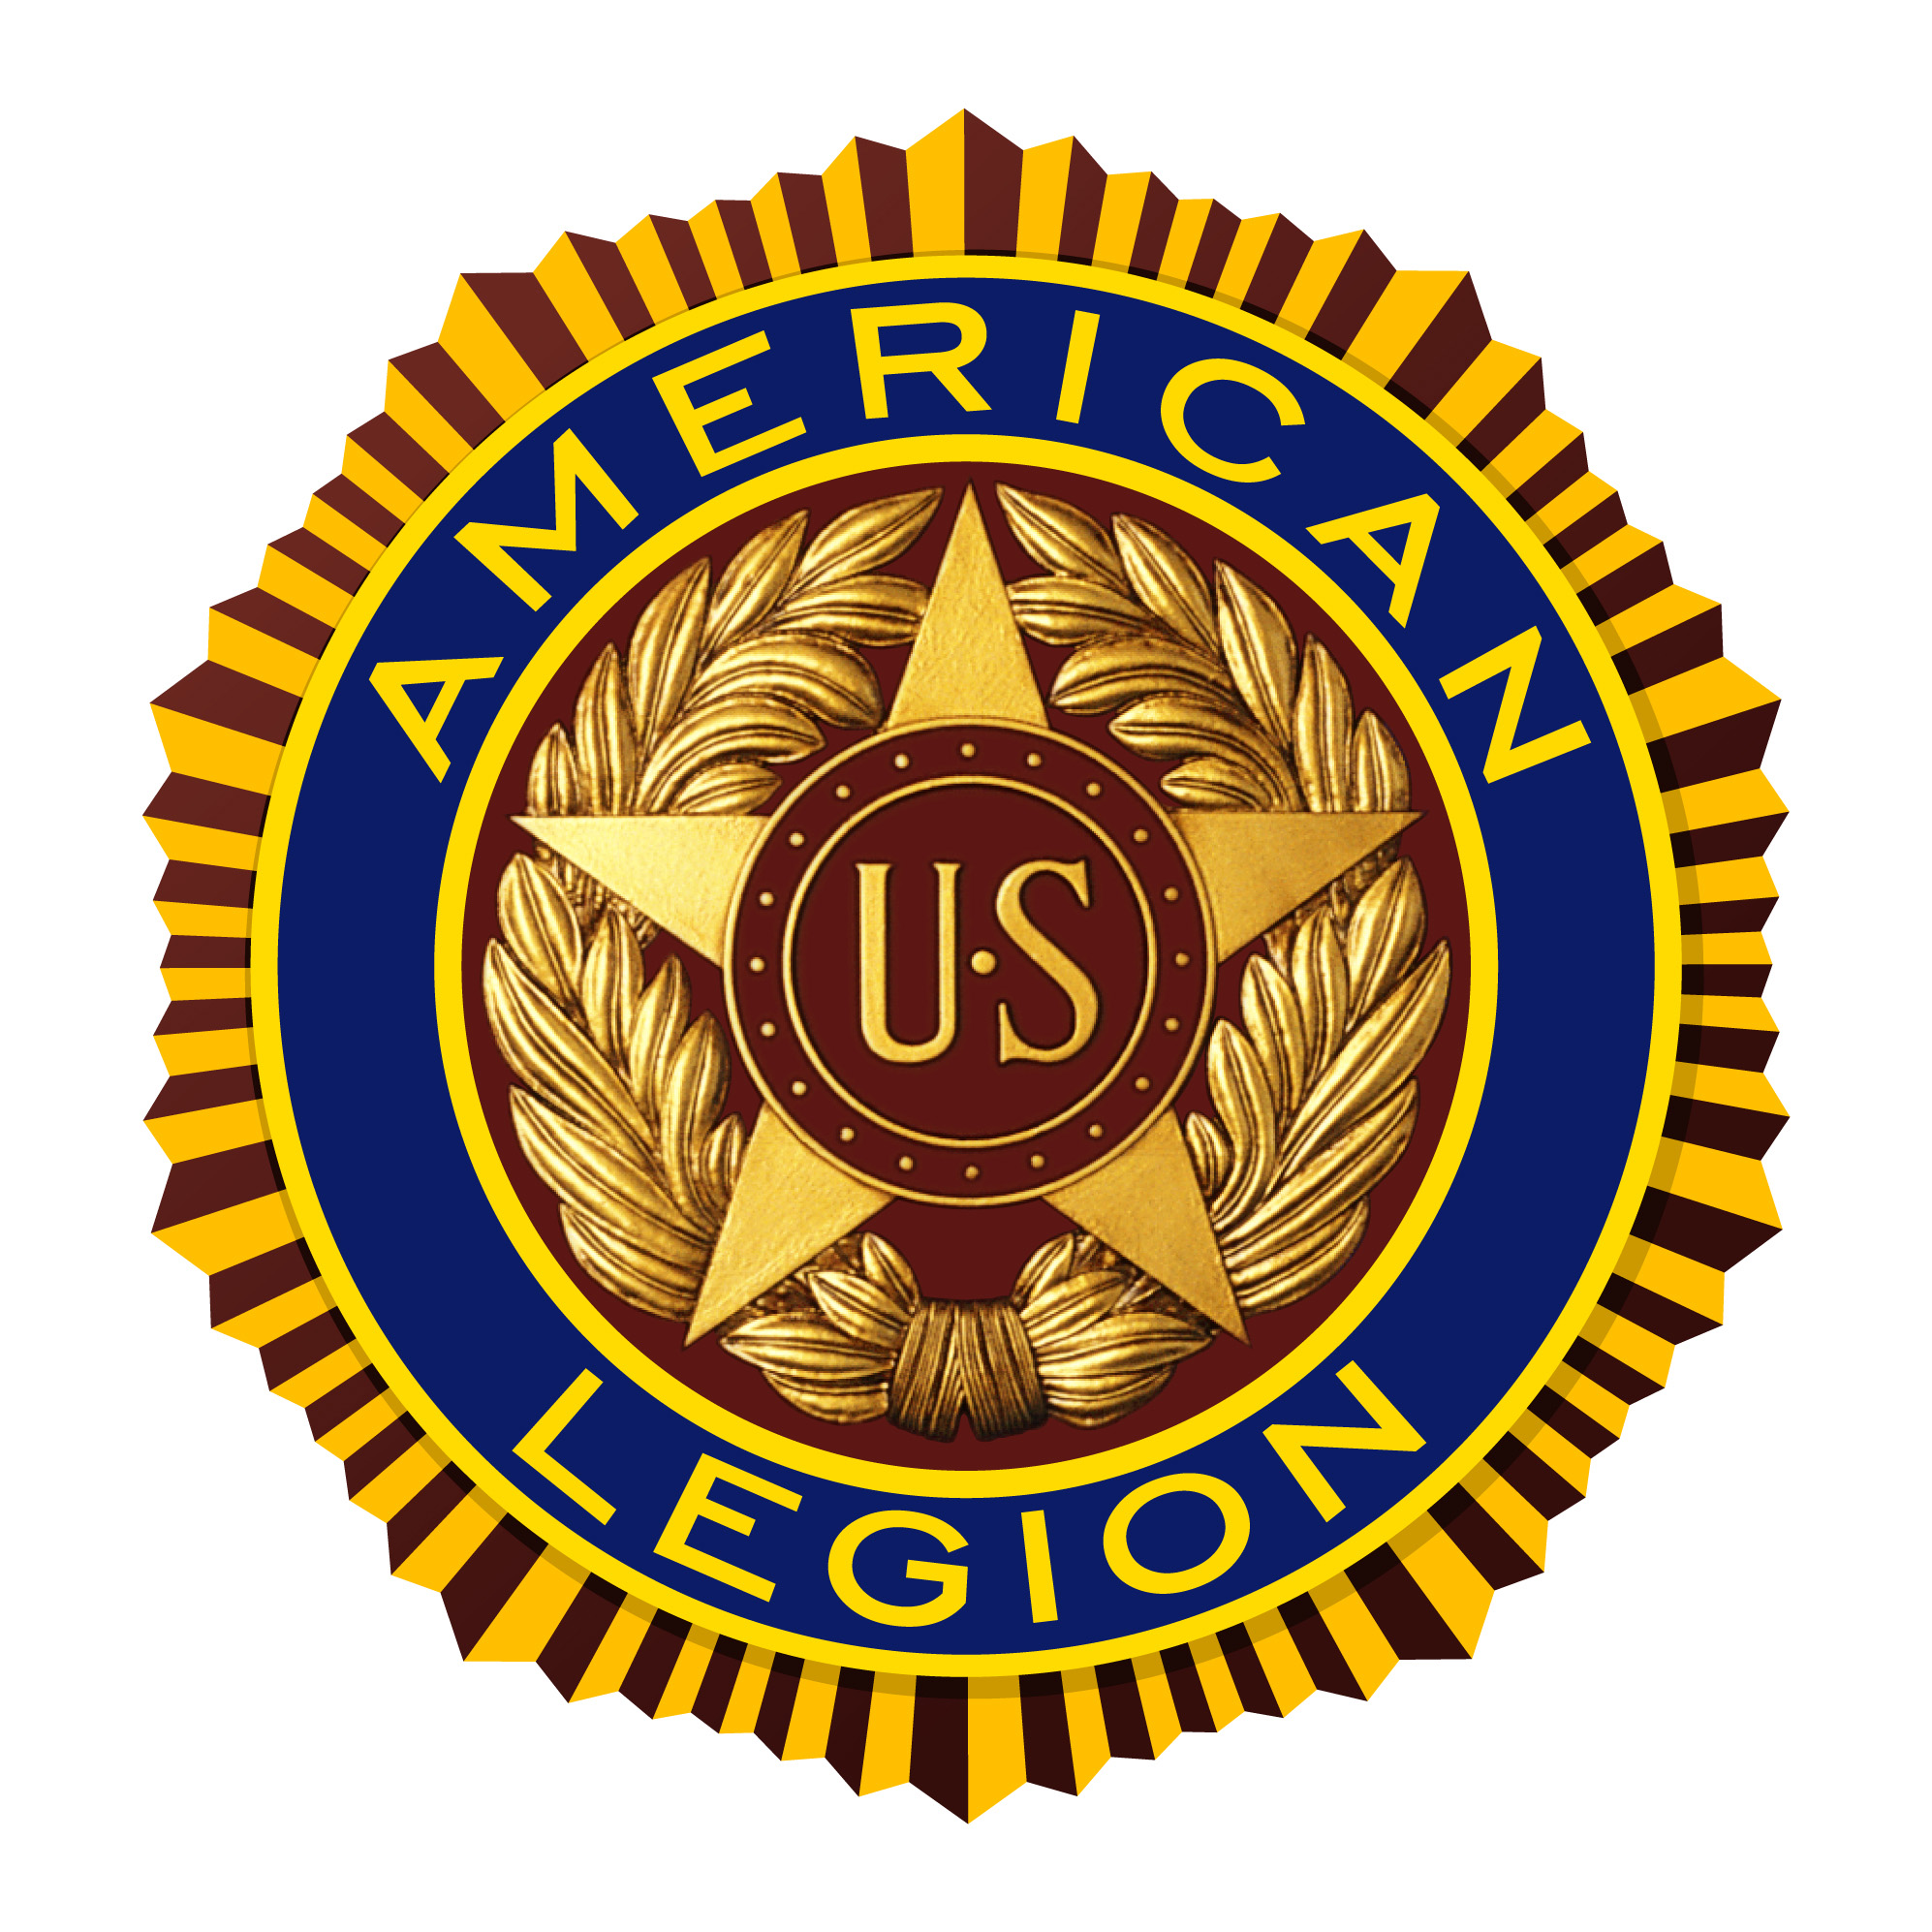 American Legion Logo PNG-PlusPNG pluspng.com-1994 - American Legion Logo PNG - American Legion PNG